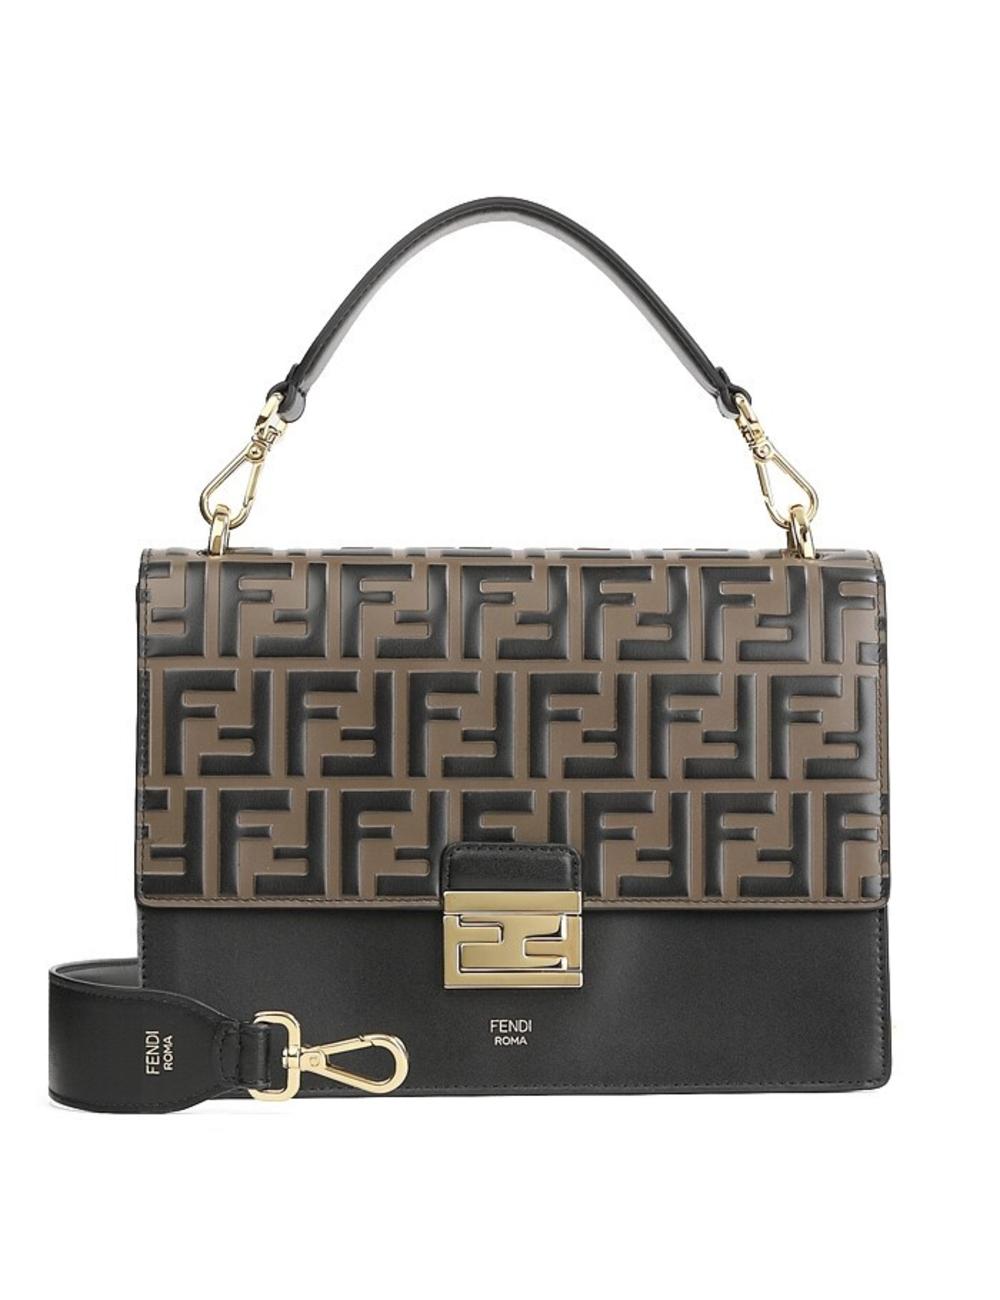 Fendi Tote bag Category: Women>BAG>Tote>Tote bag Vintage: False Color code (RGB code): #090908 Gende